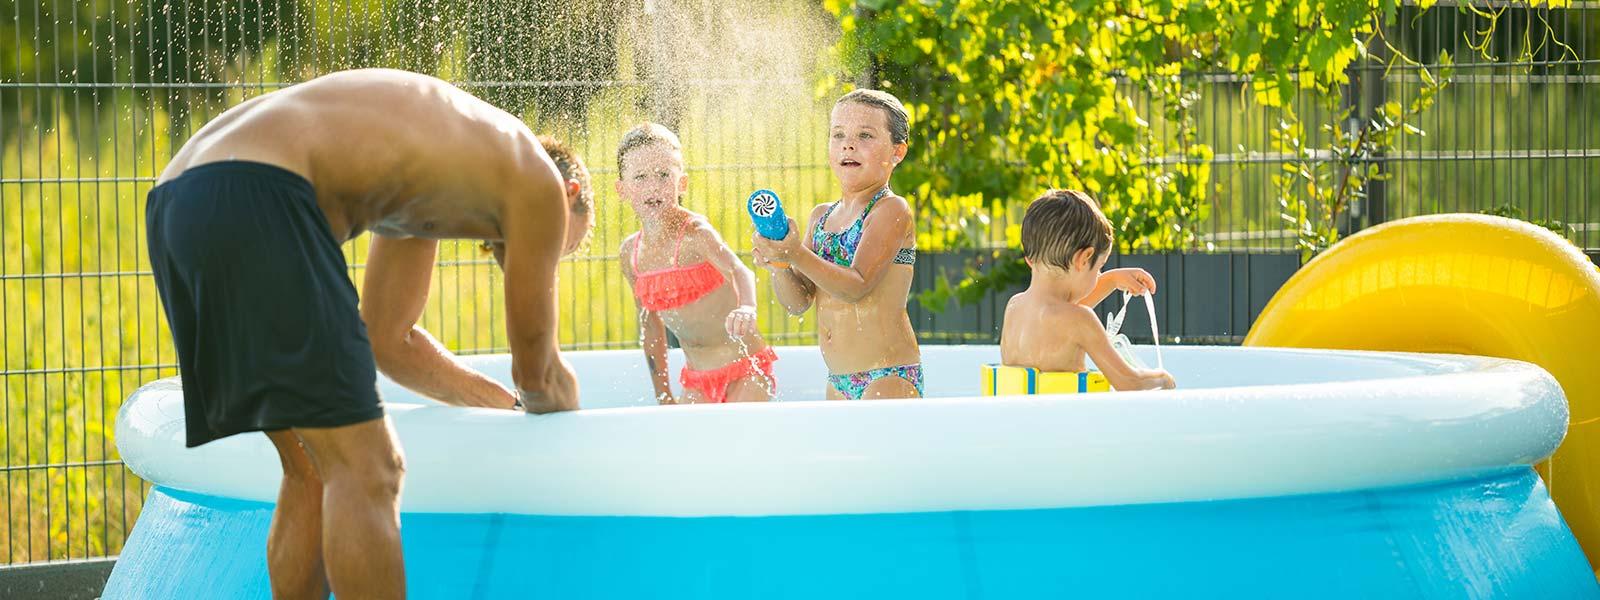 Befüllen und Entleeren von Swimmingpools